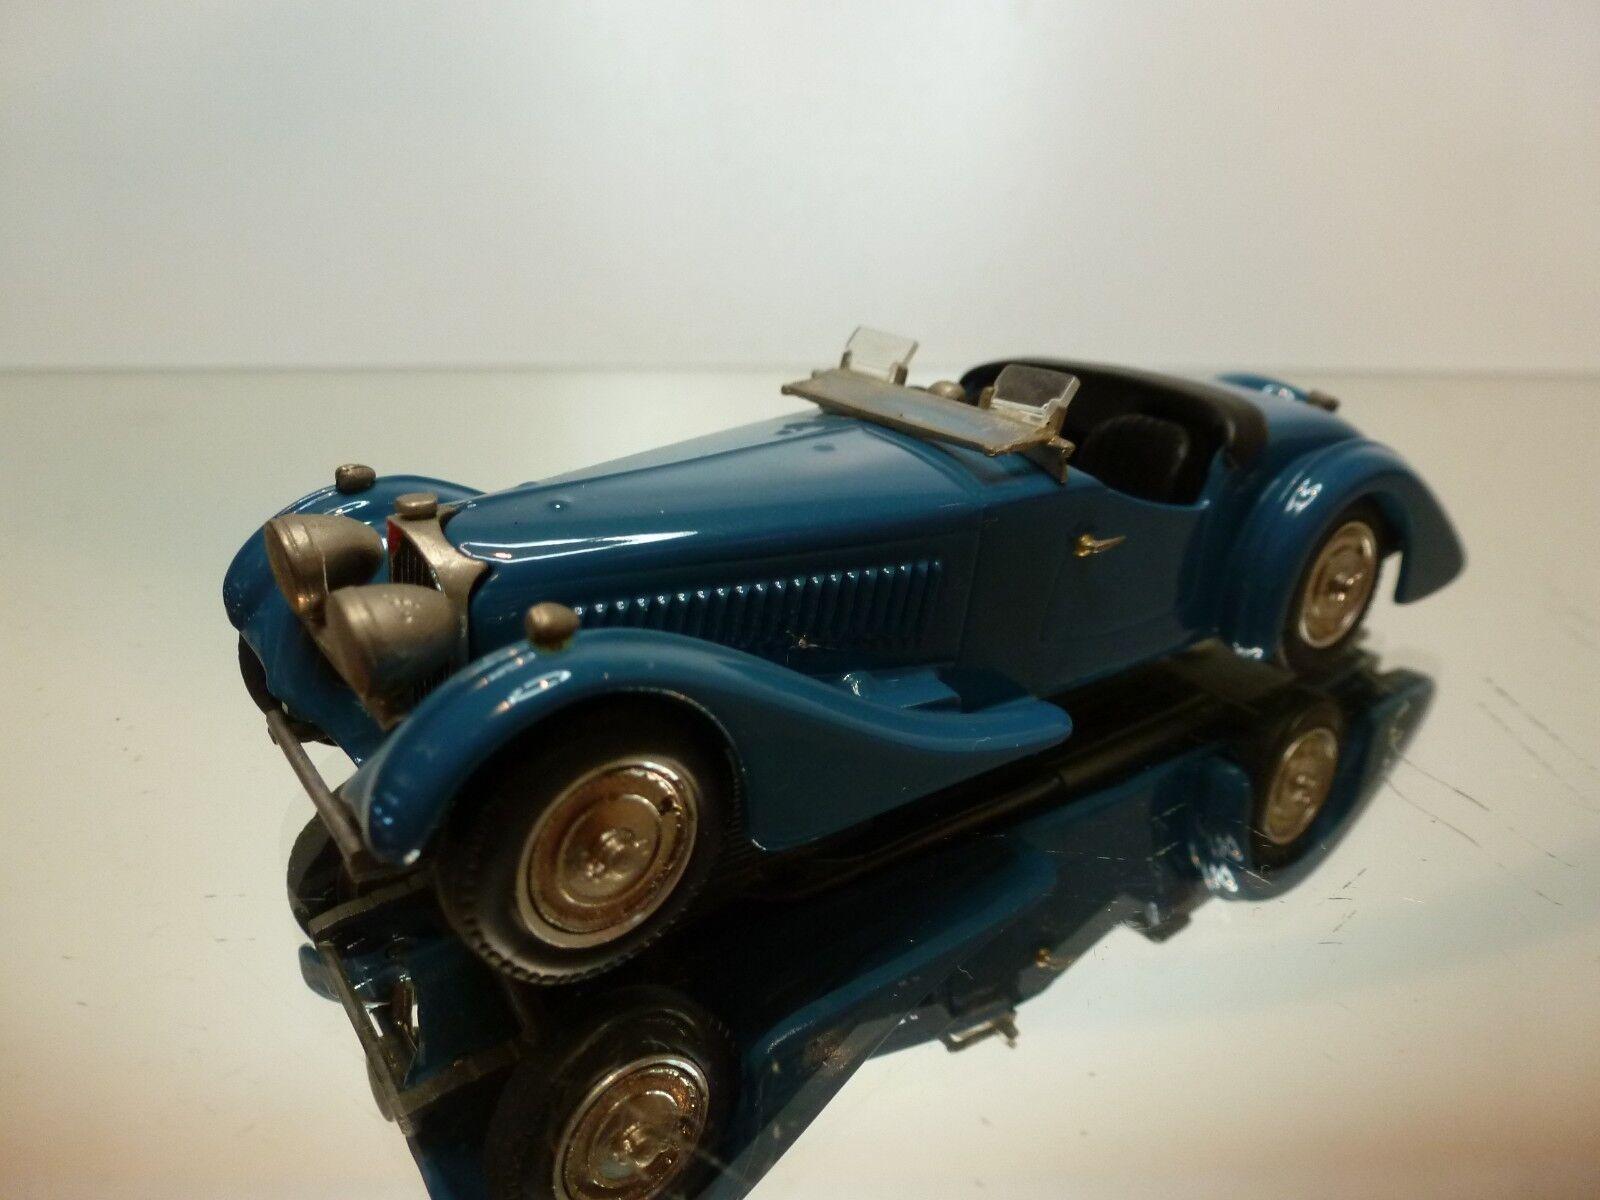 WESTERN MODELS  39 BUGATTI 57 CORSICA TOURER 1938 - bleu 1 43 - VERY GOOD - 2  livraison rapide